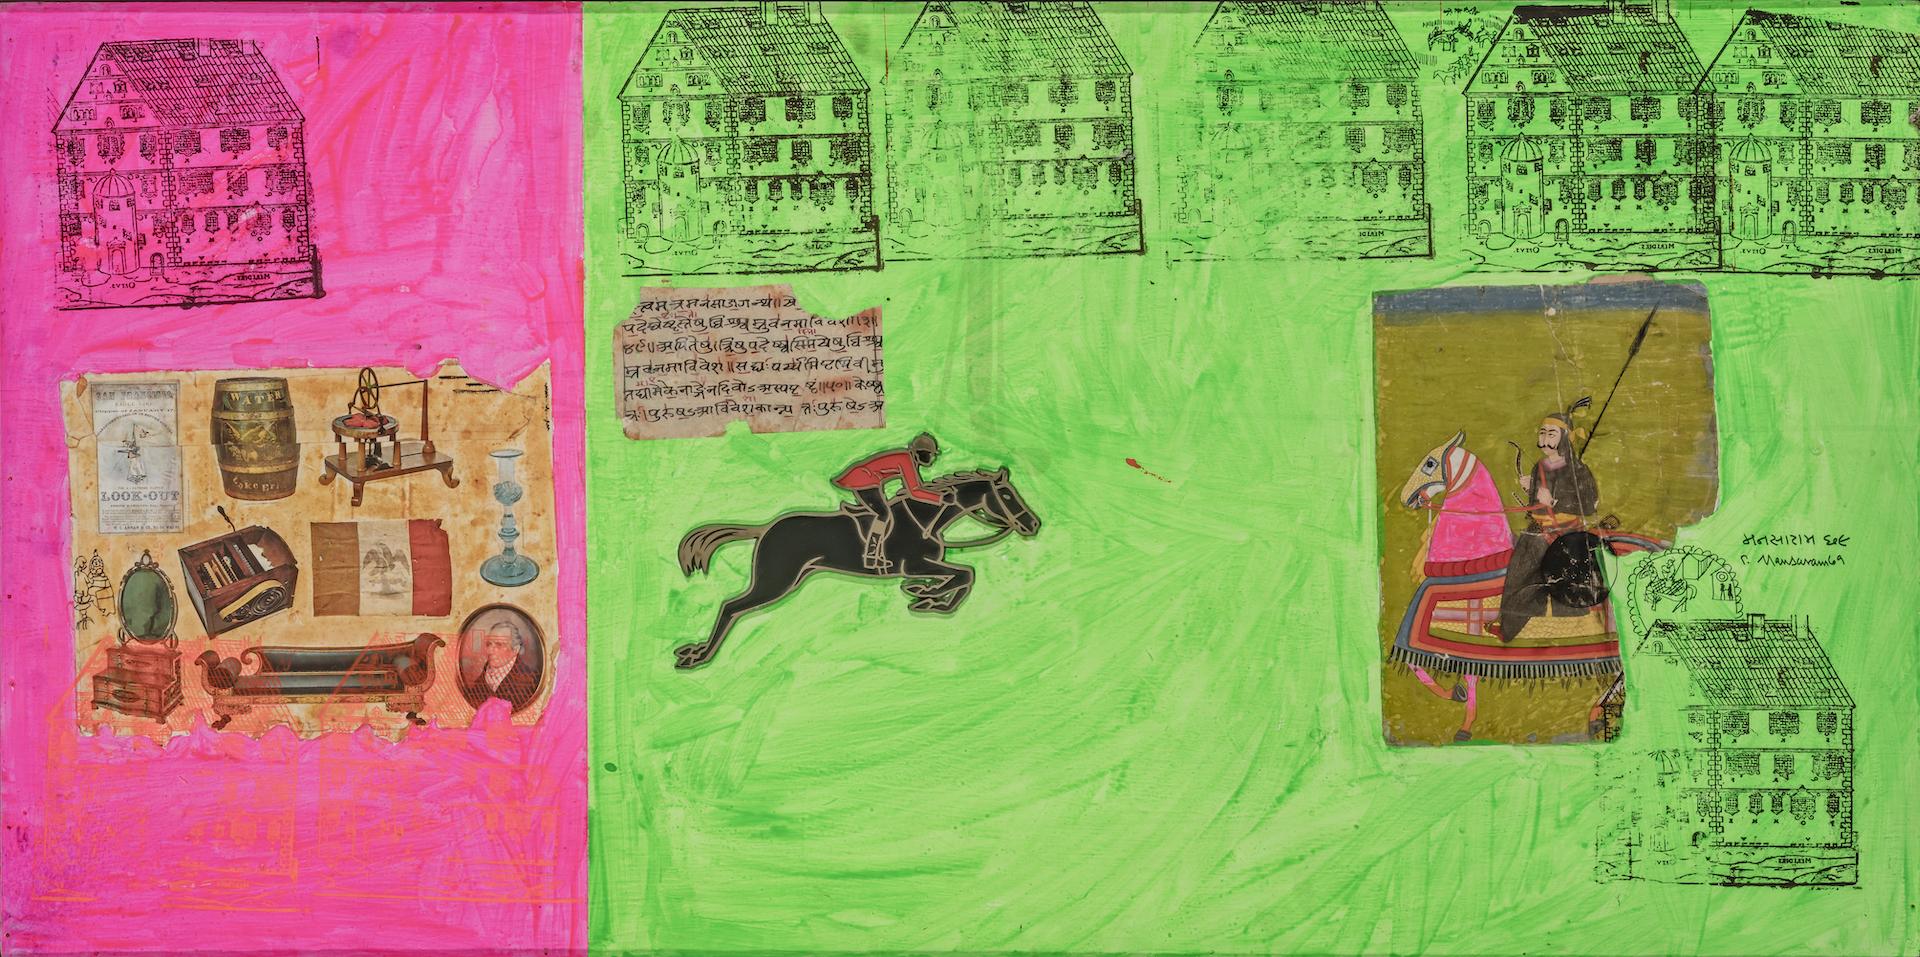 P. Manasaram - Artist Run Centre - Rungh Magazine Volume 6, Number 2